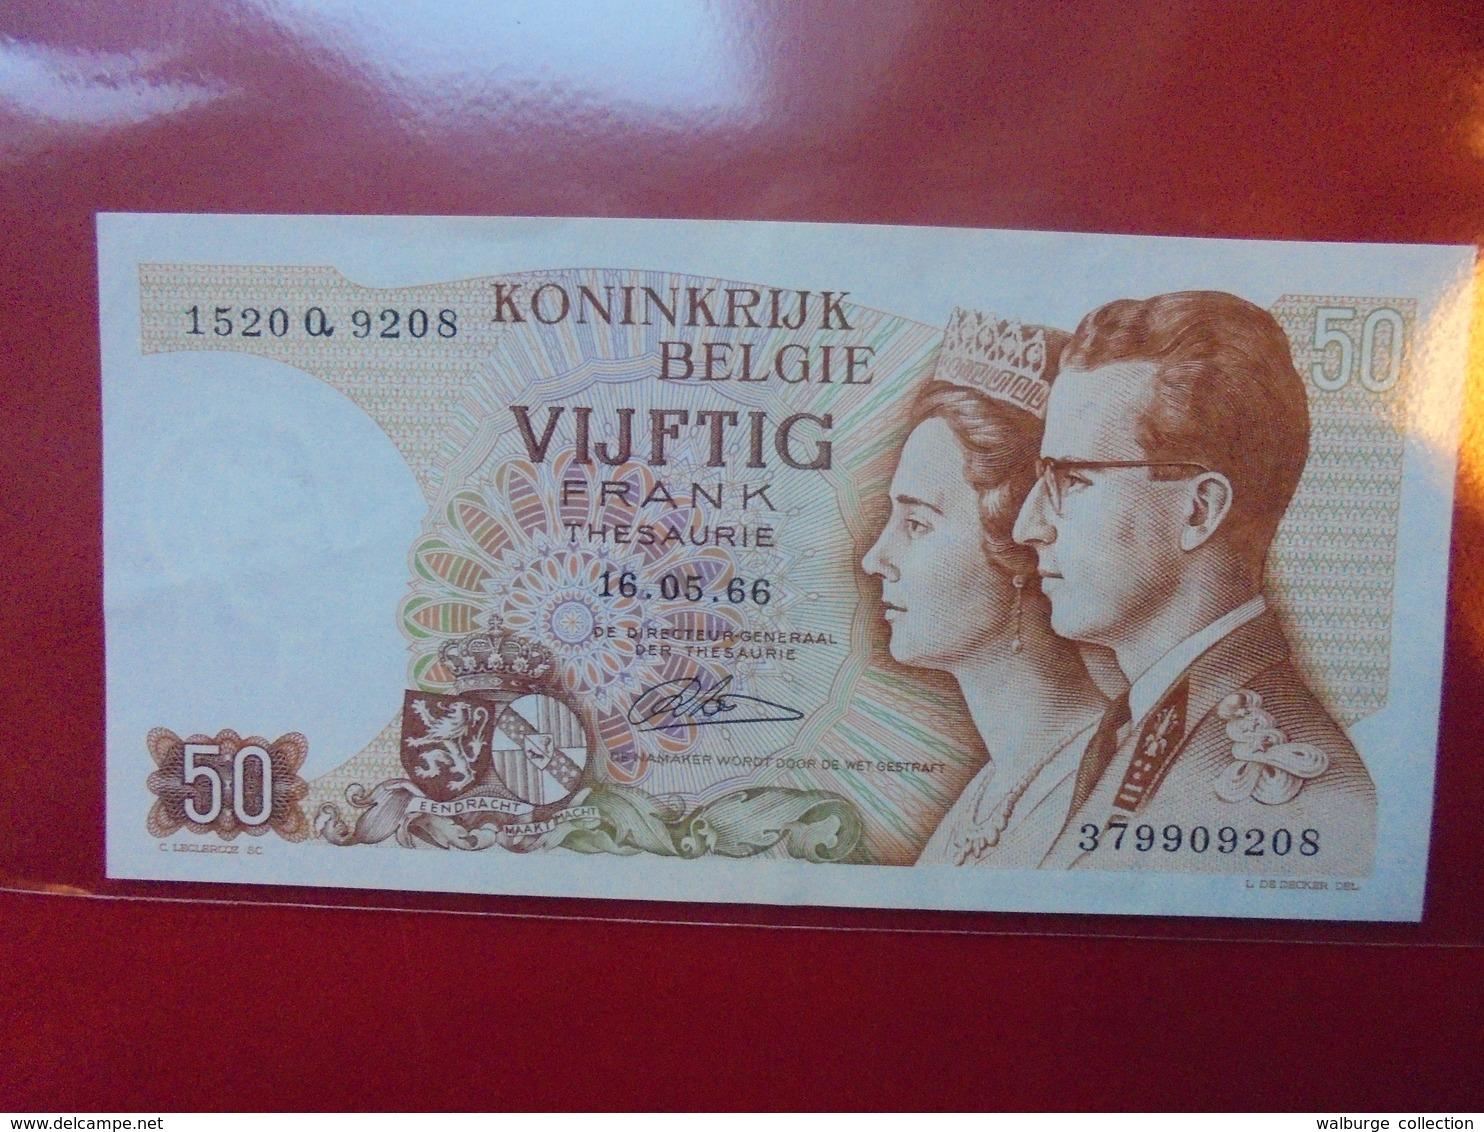 BELGIQUE 50 FRANCS 1966 CIRCULER  BELLE QUALITE ! - 50 Francs